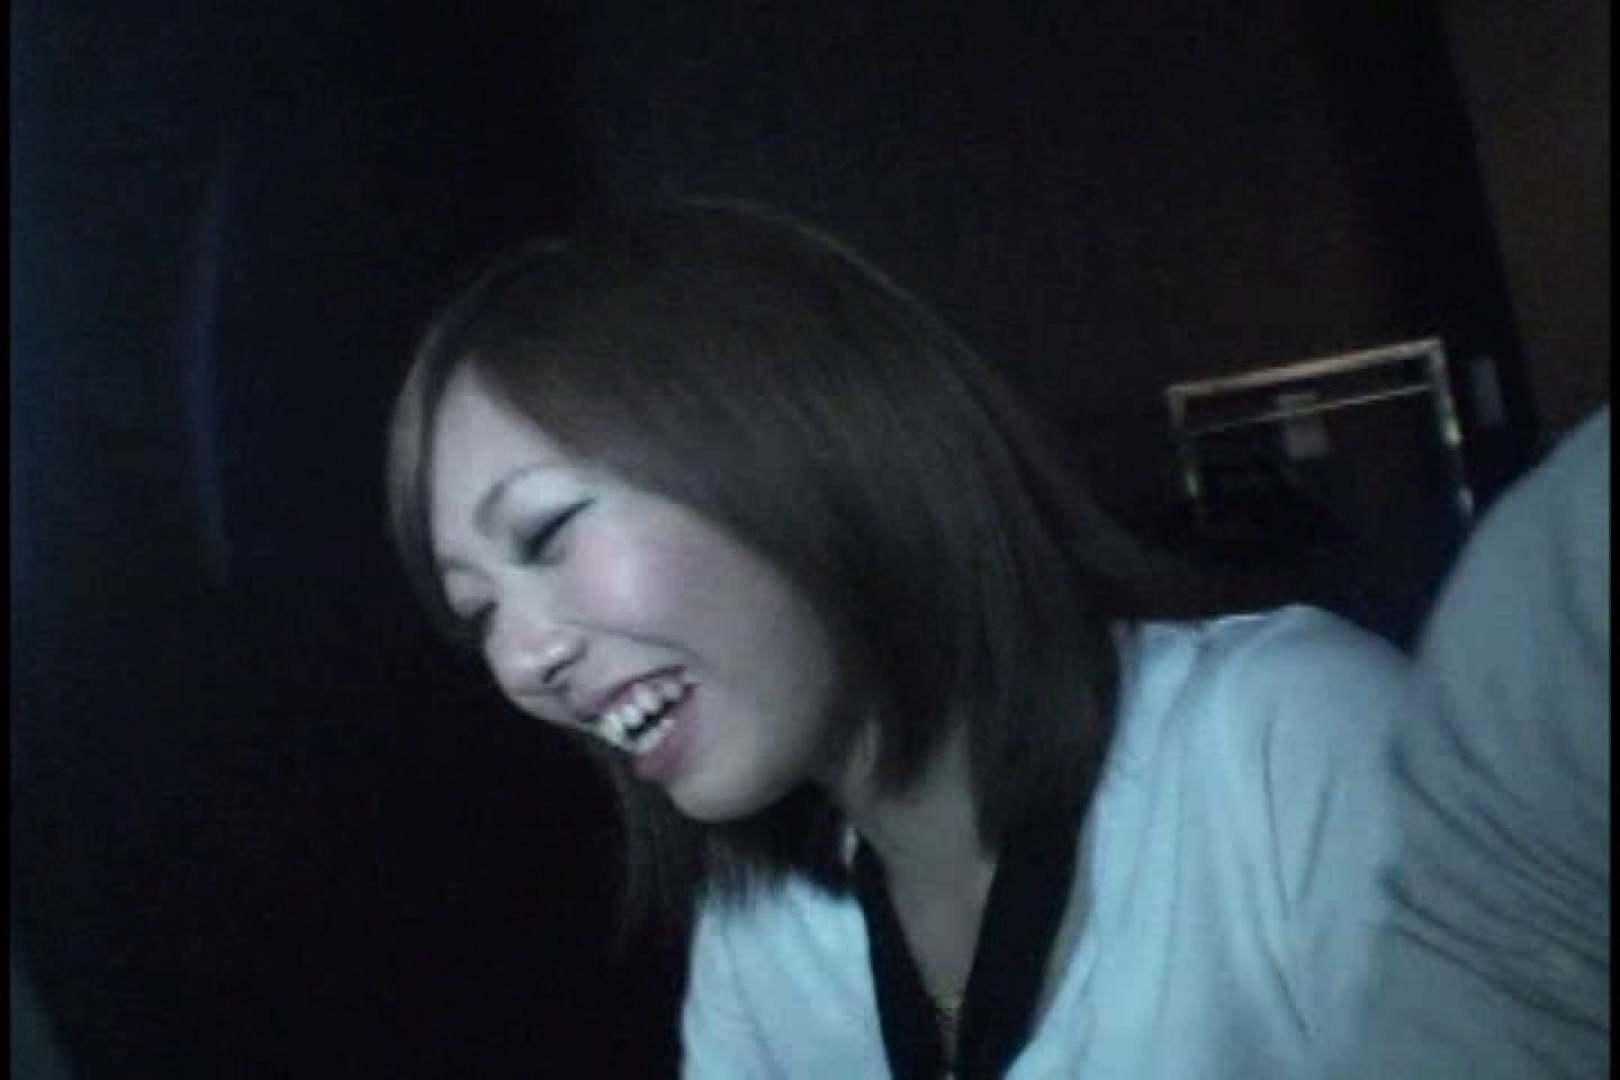 JDハンター全国ツアー vol.036 前編 女子大生のエロ動画  85PIX 42